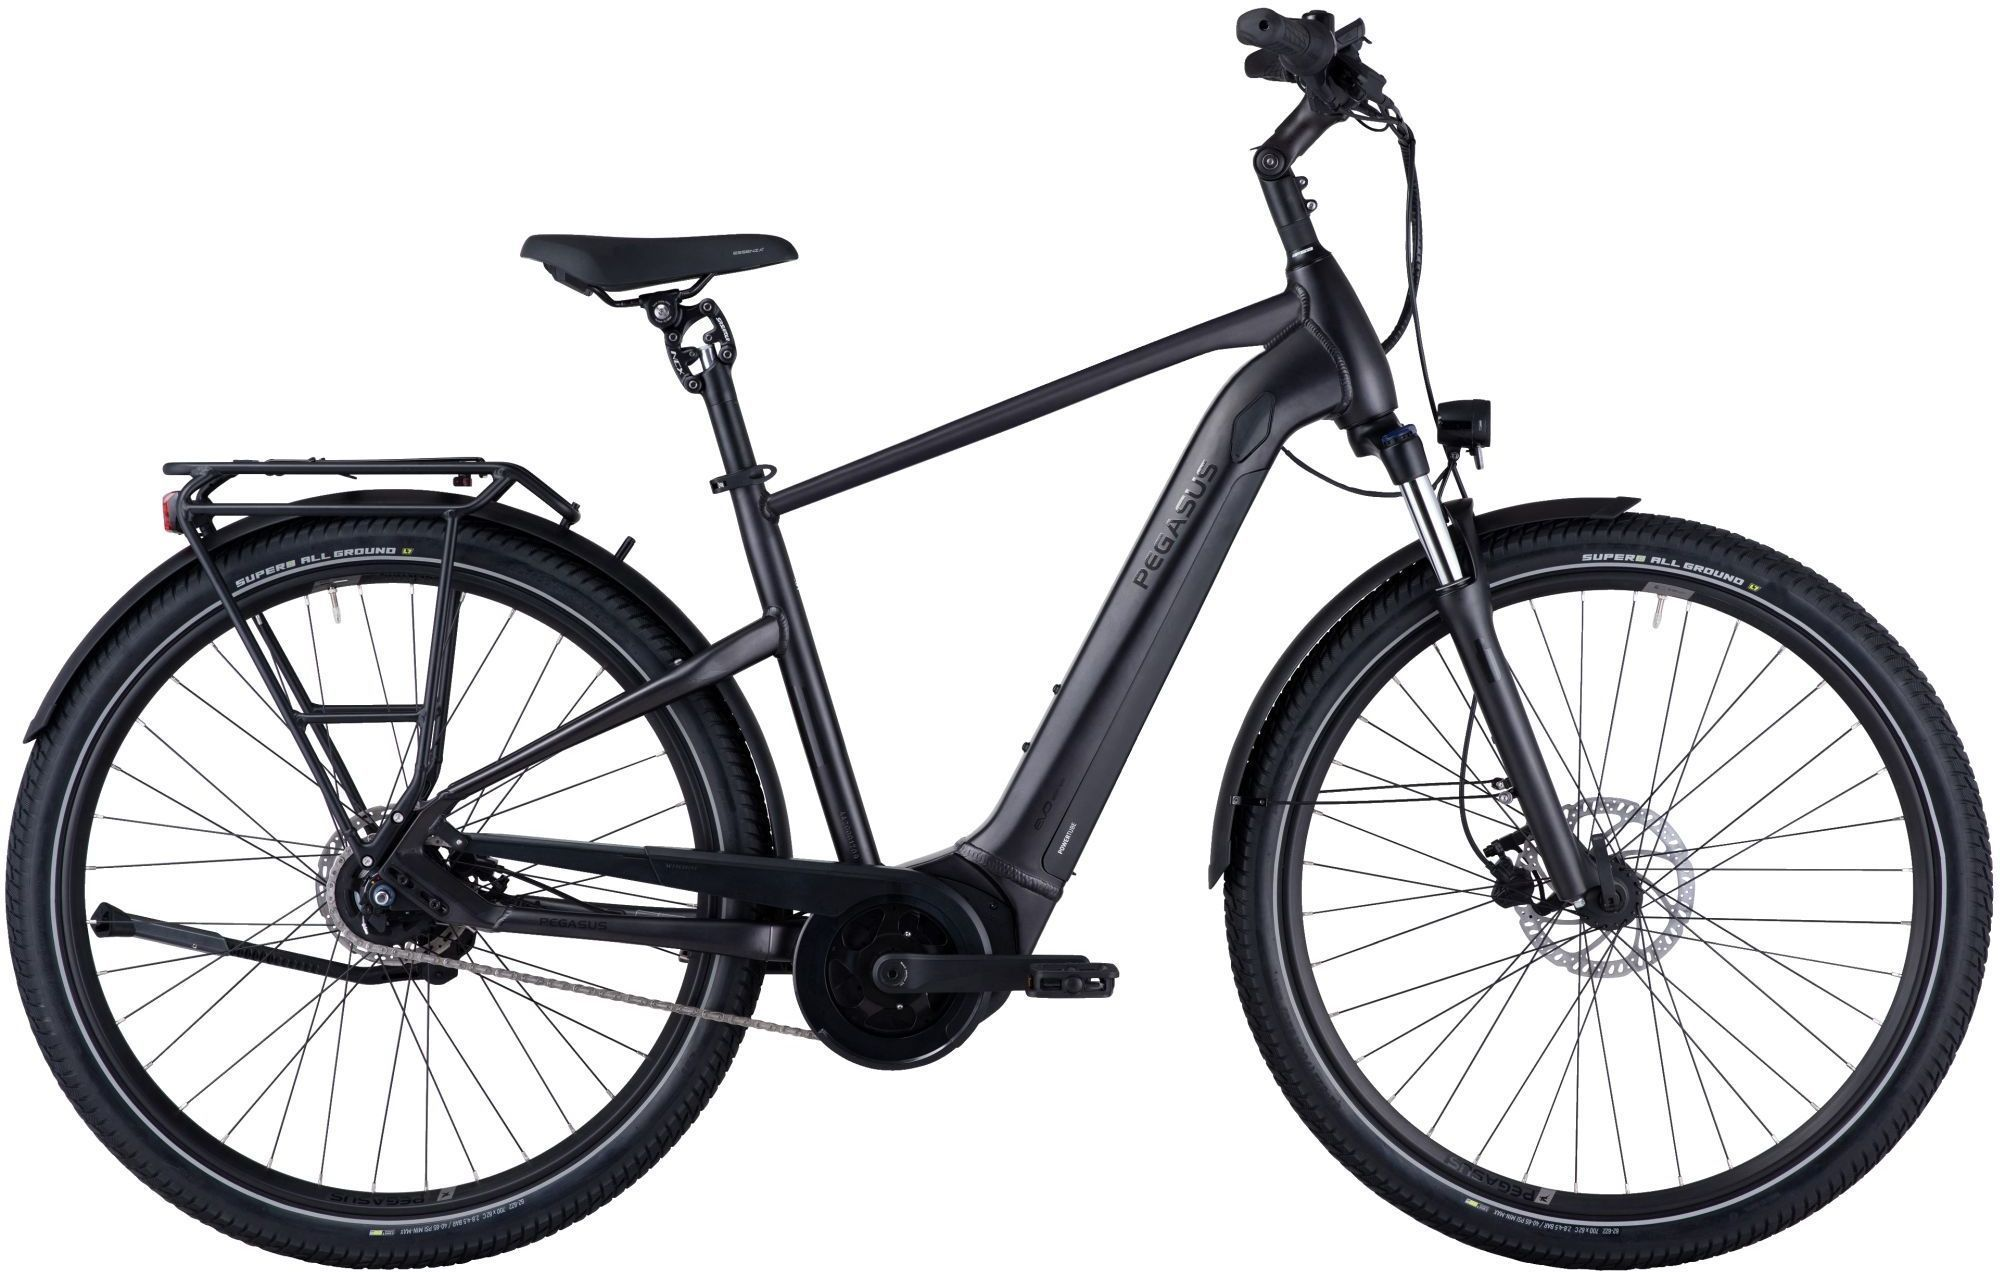 E-Bikes/Citybikes: Diamant  Savino EVO 5R Performance (625 Wh) 5 Gang Nabenschaltung Herrenfahrrad Diamant Modell 2021 28 Zoll 40 cm shimano gr